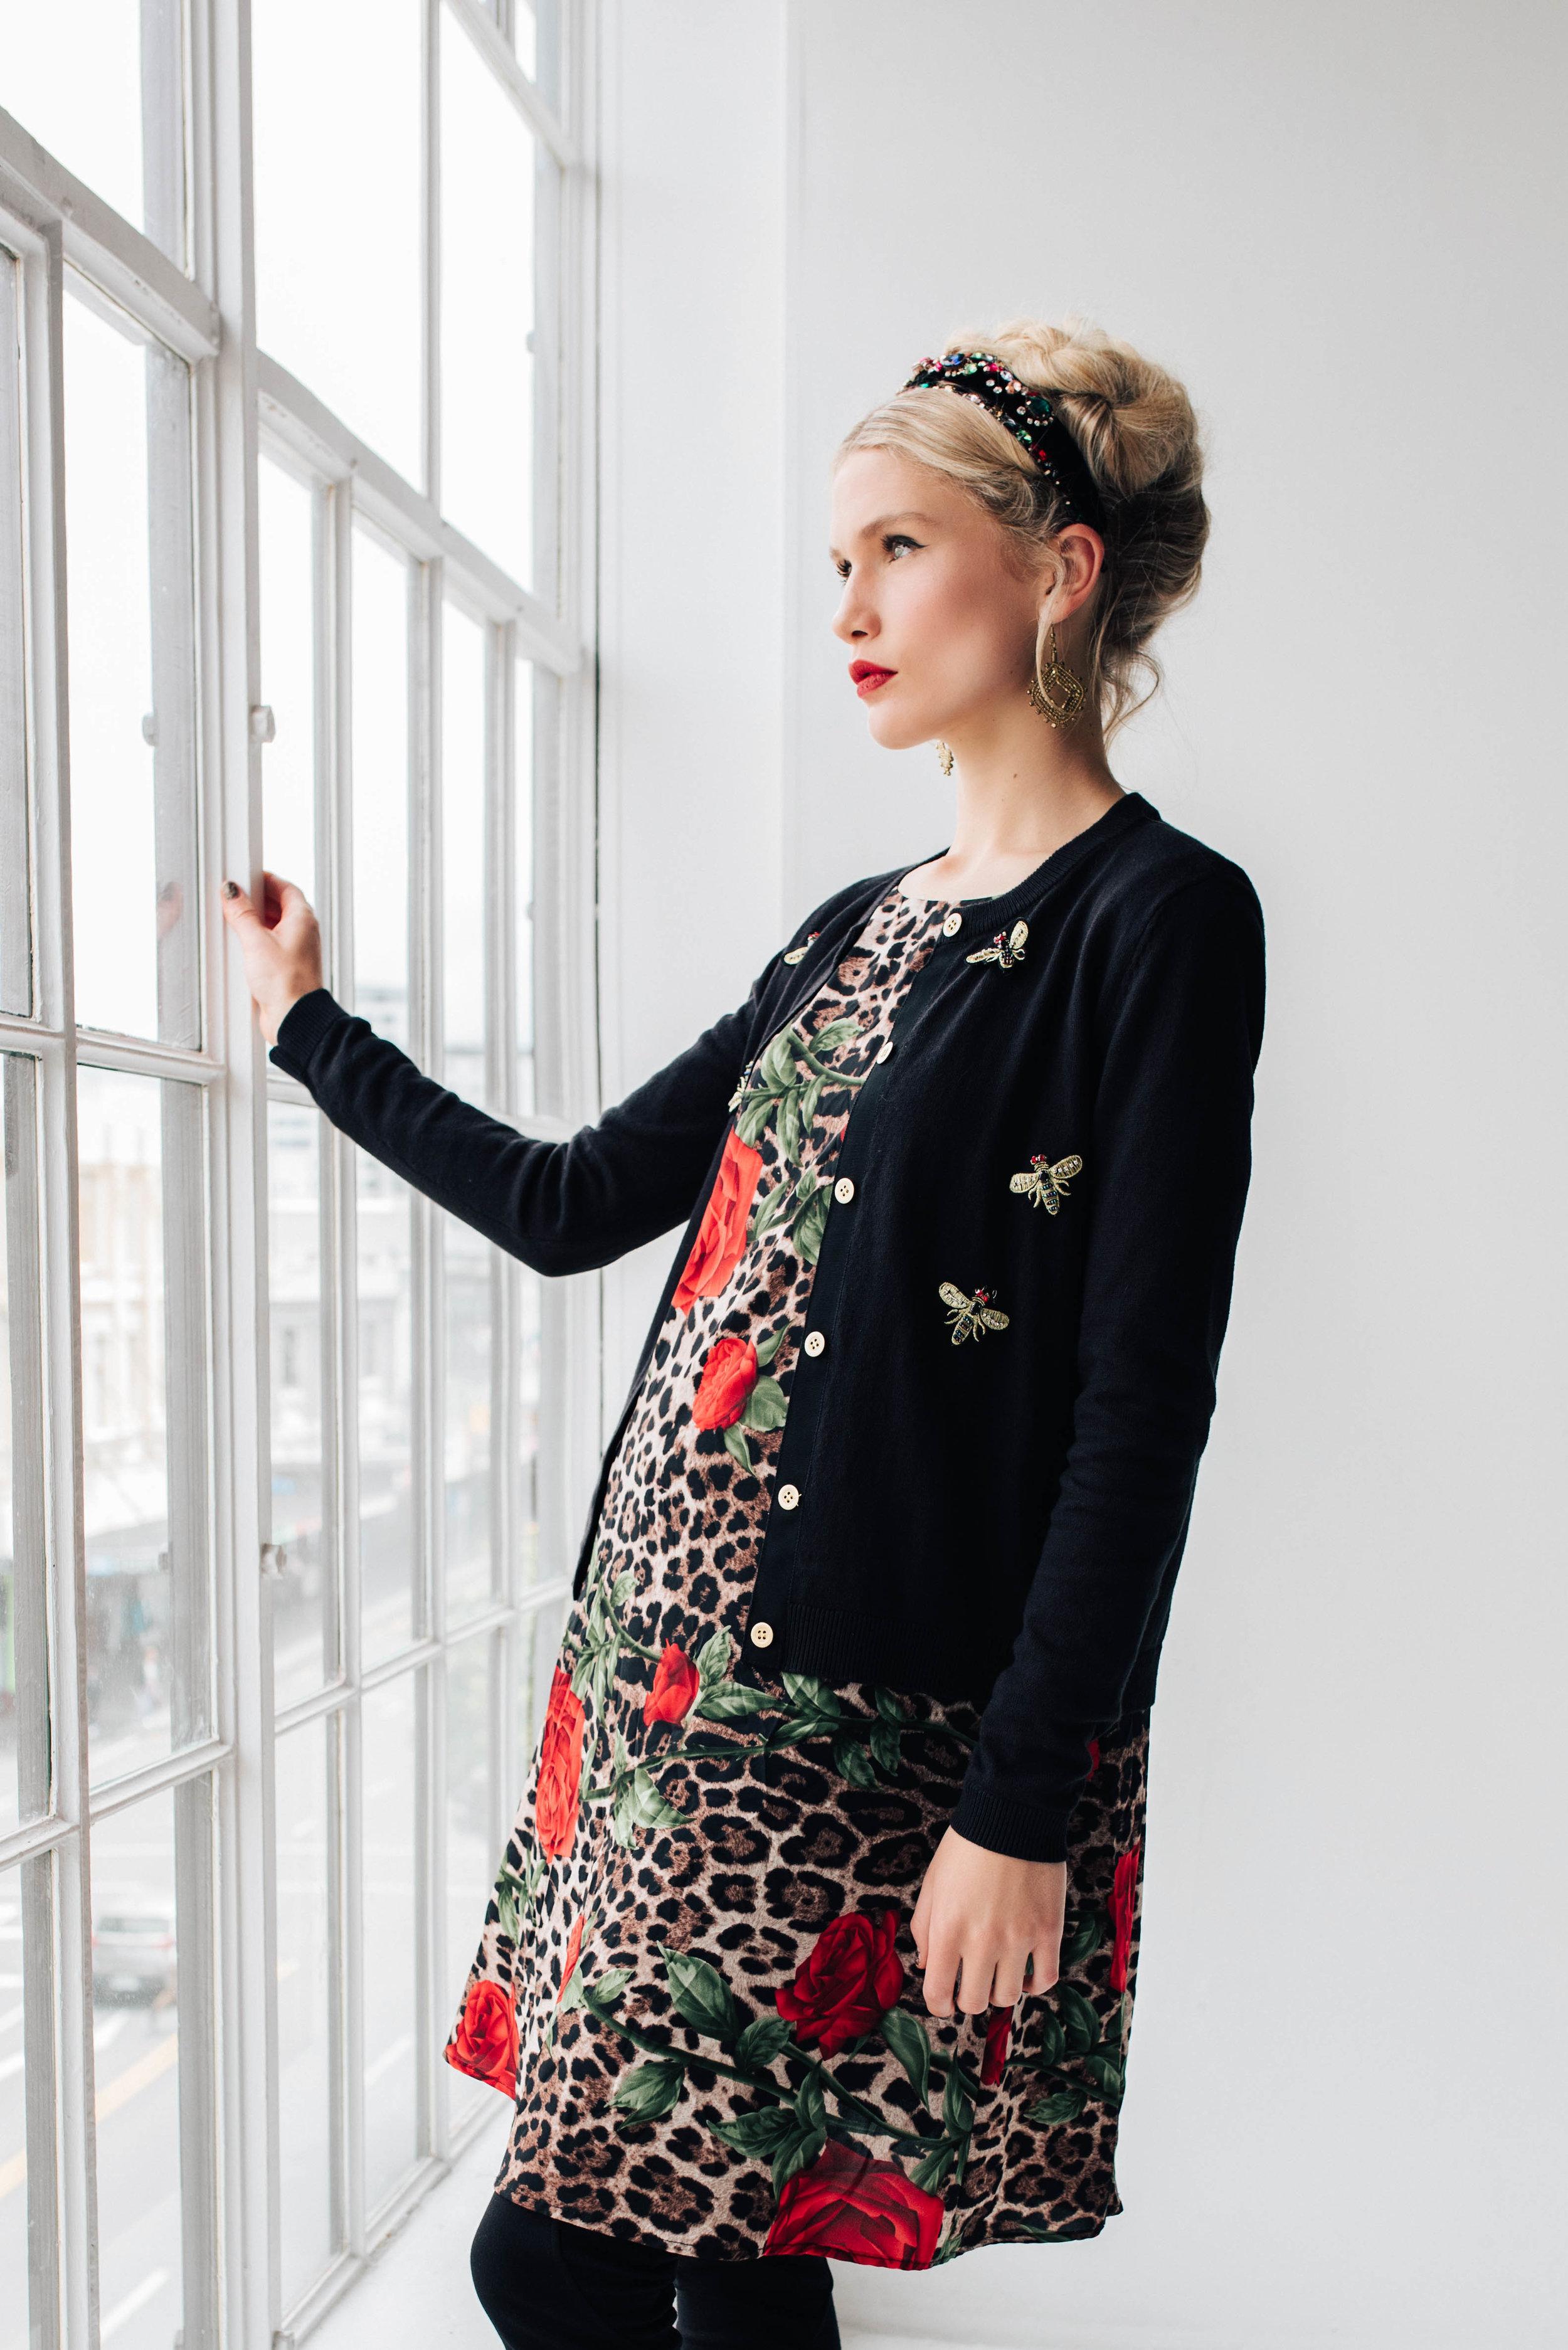 5906W Shilo Dress Red Rose Skin 6198W Jewelled Cardi Glamour Gold